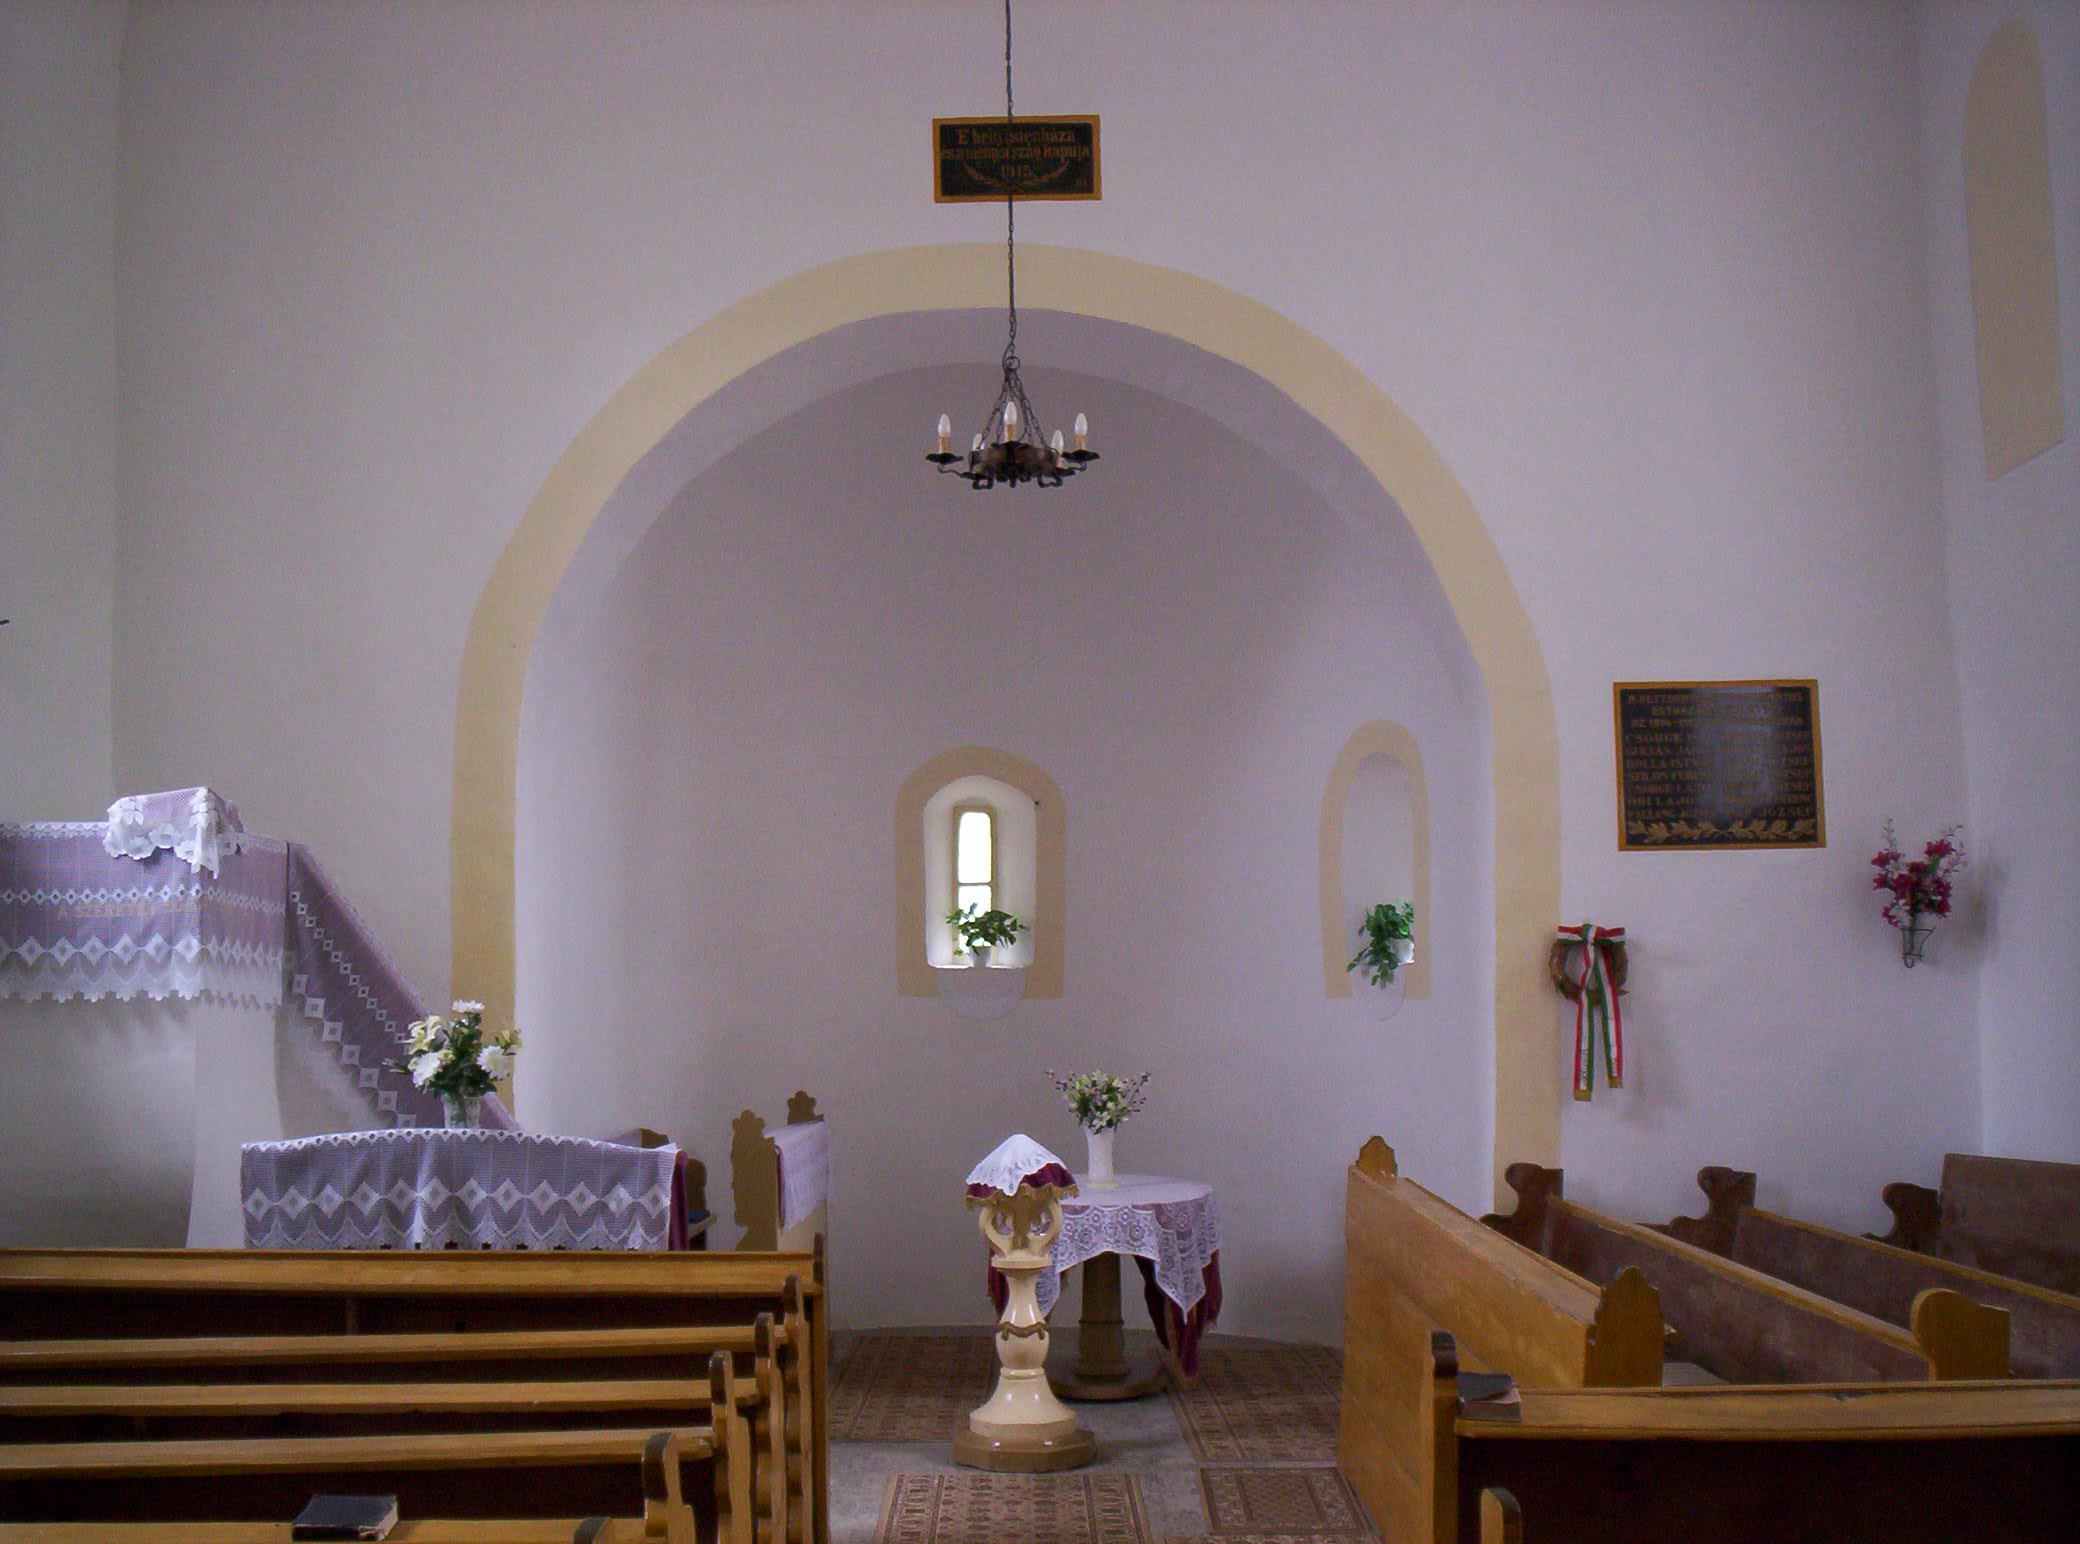 File:Kéttornyúlak Calvinist church inside.jpg - Wikimedia ...